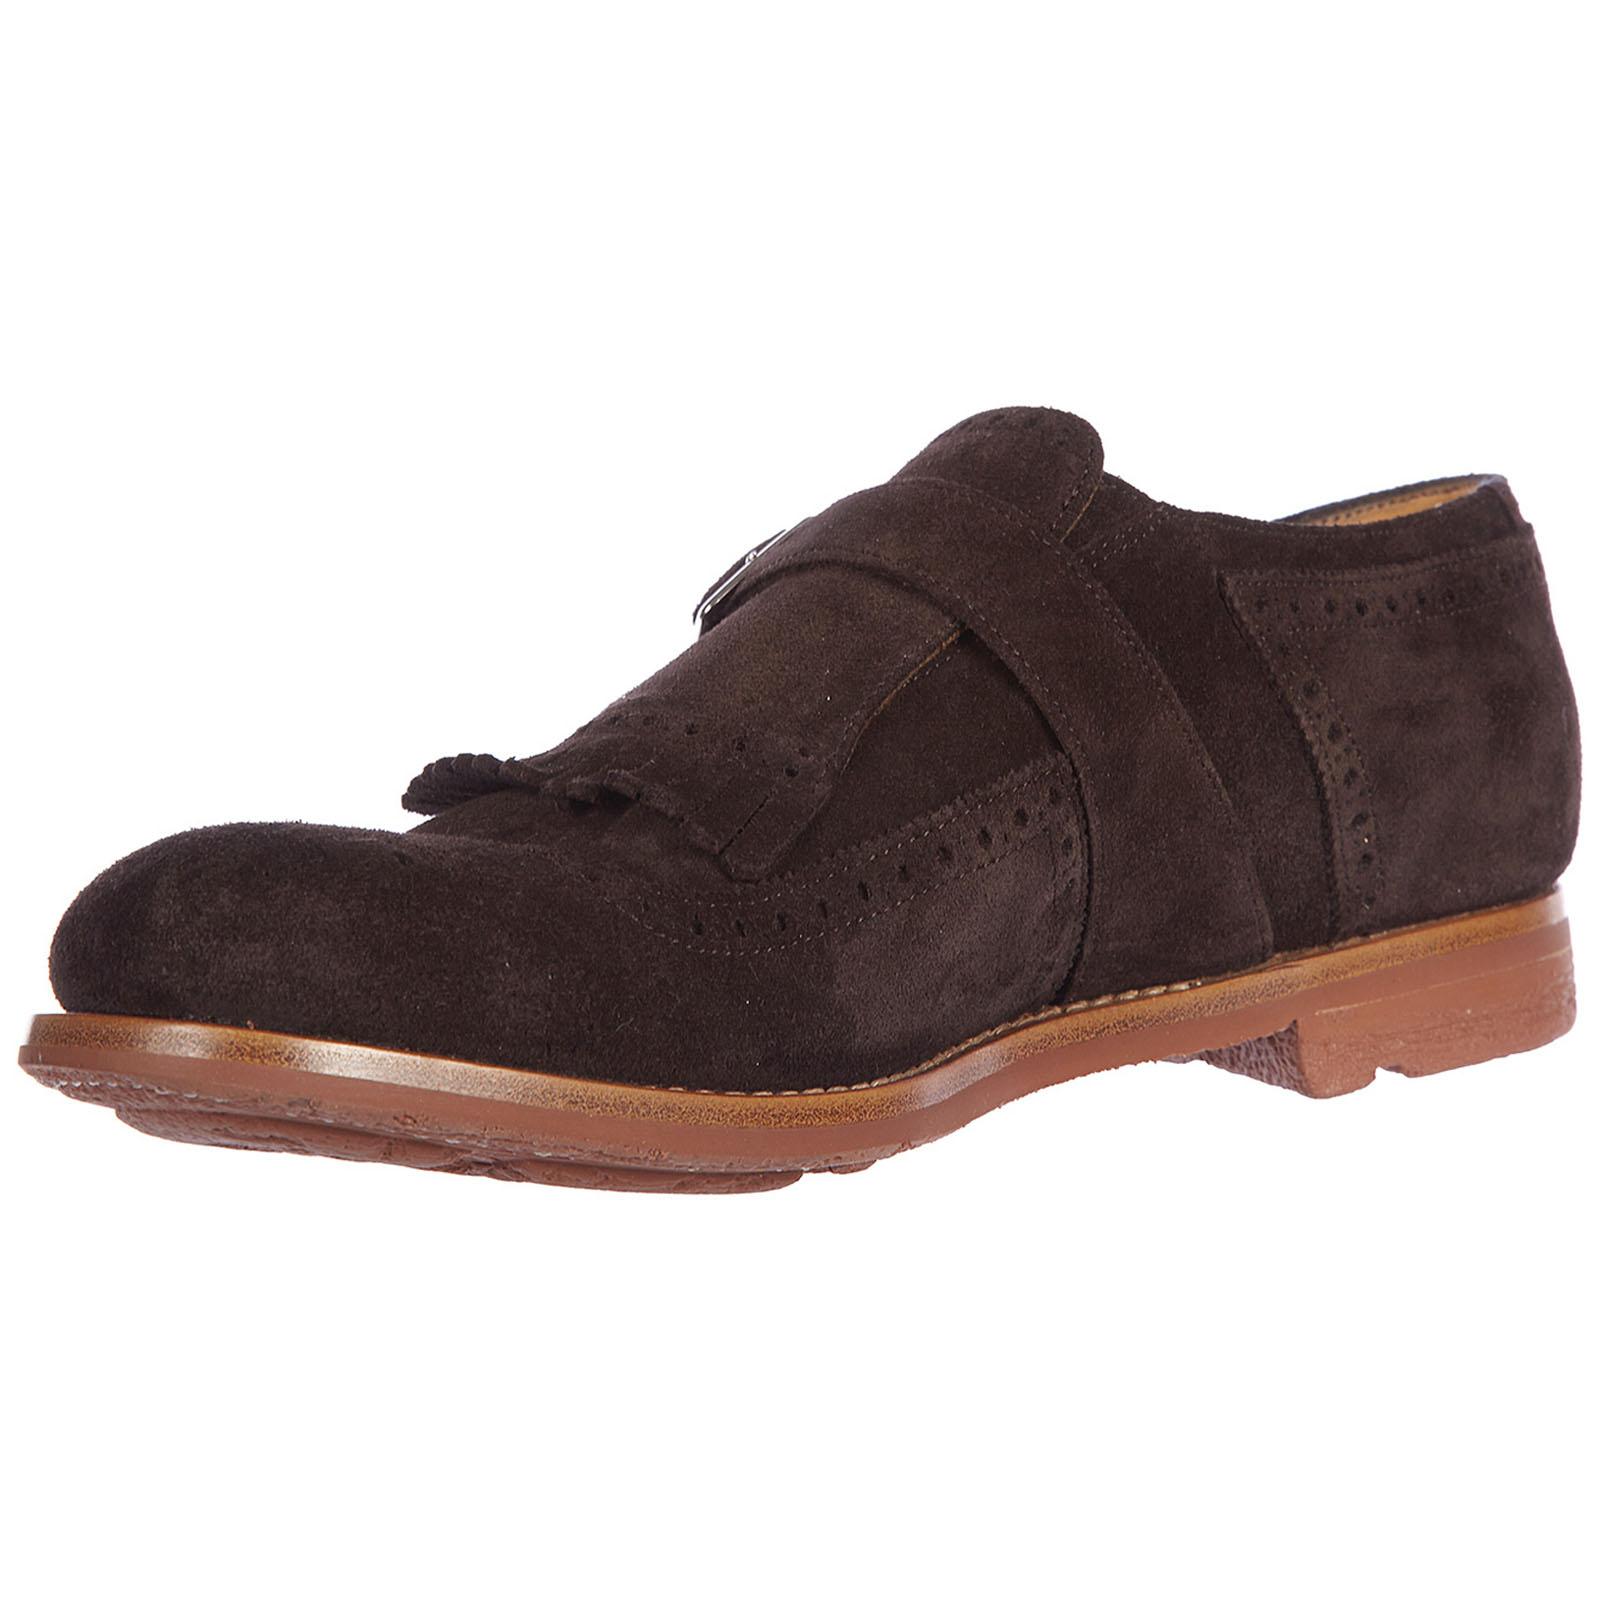 Men's classic suede formal shoes slip on monkstrap